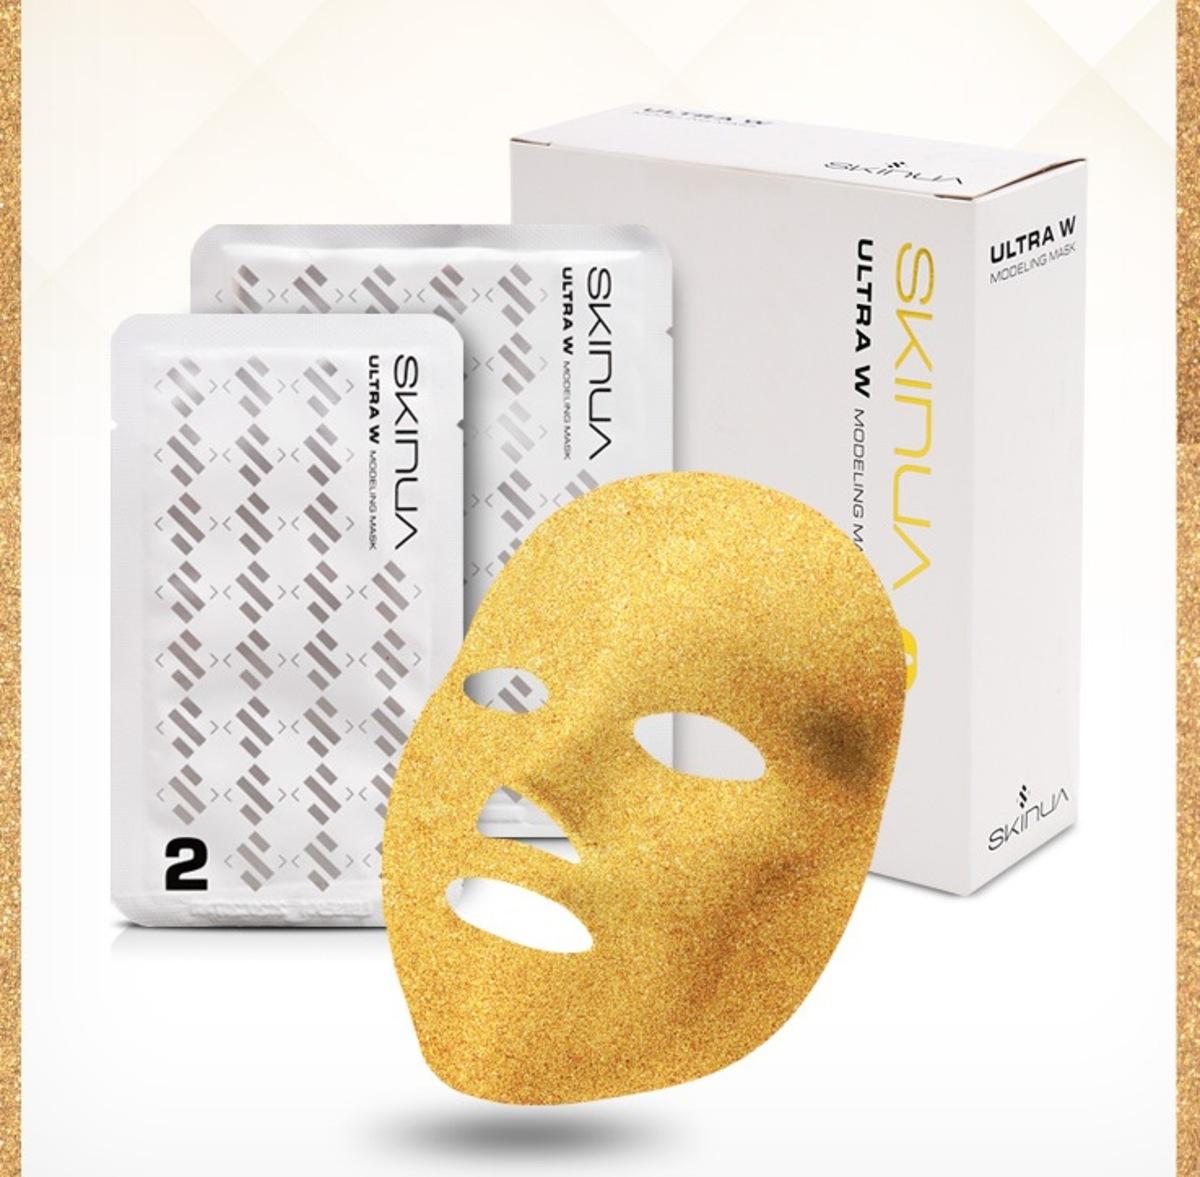 SKINUA ULTRA W Modeling Mask